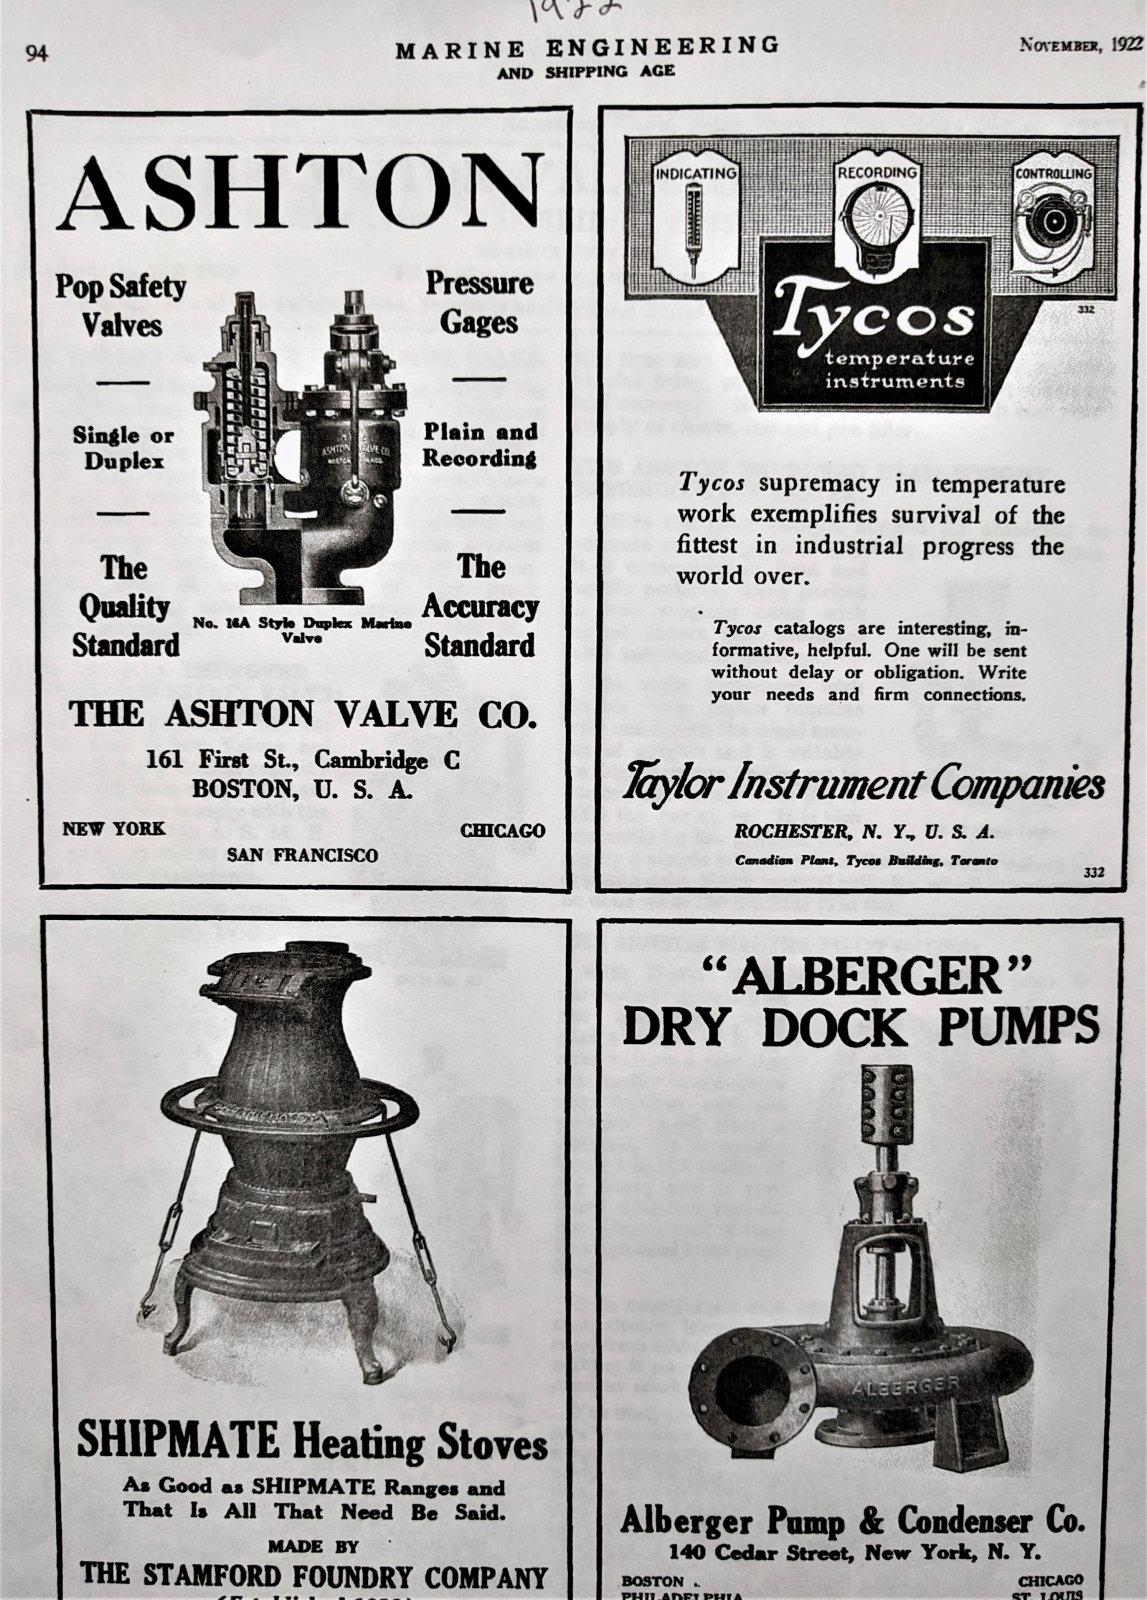 1922 Marine Engineering.jpg